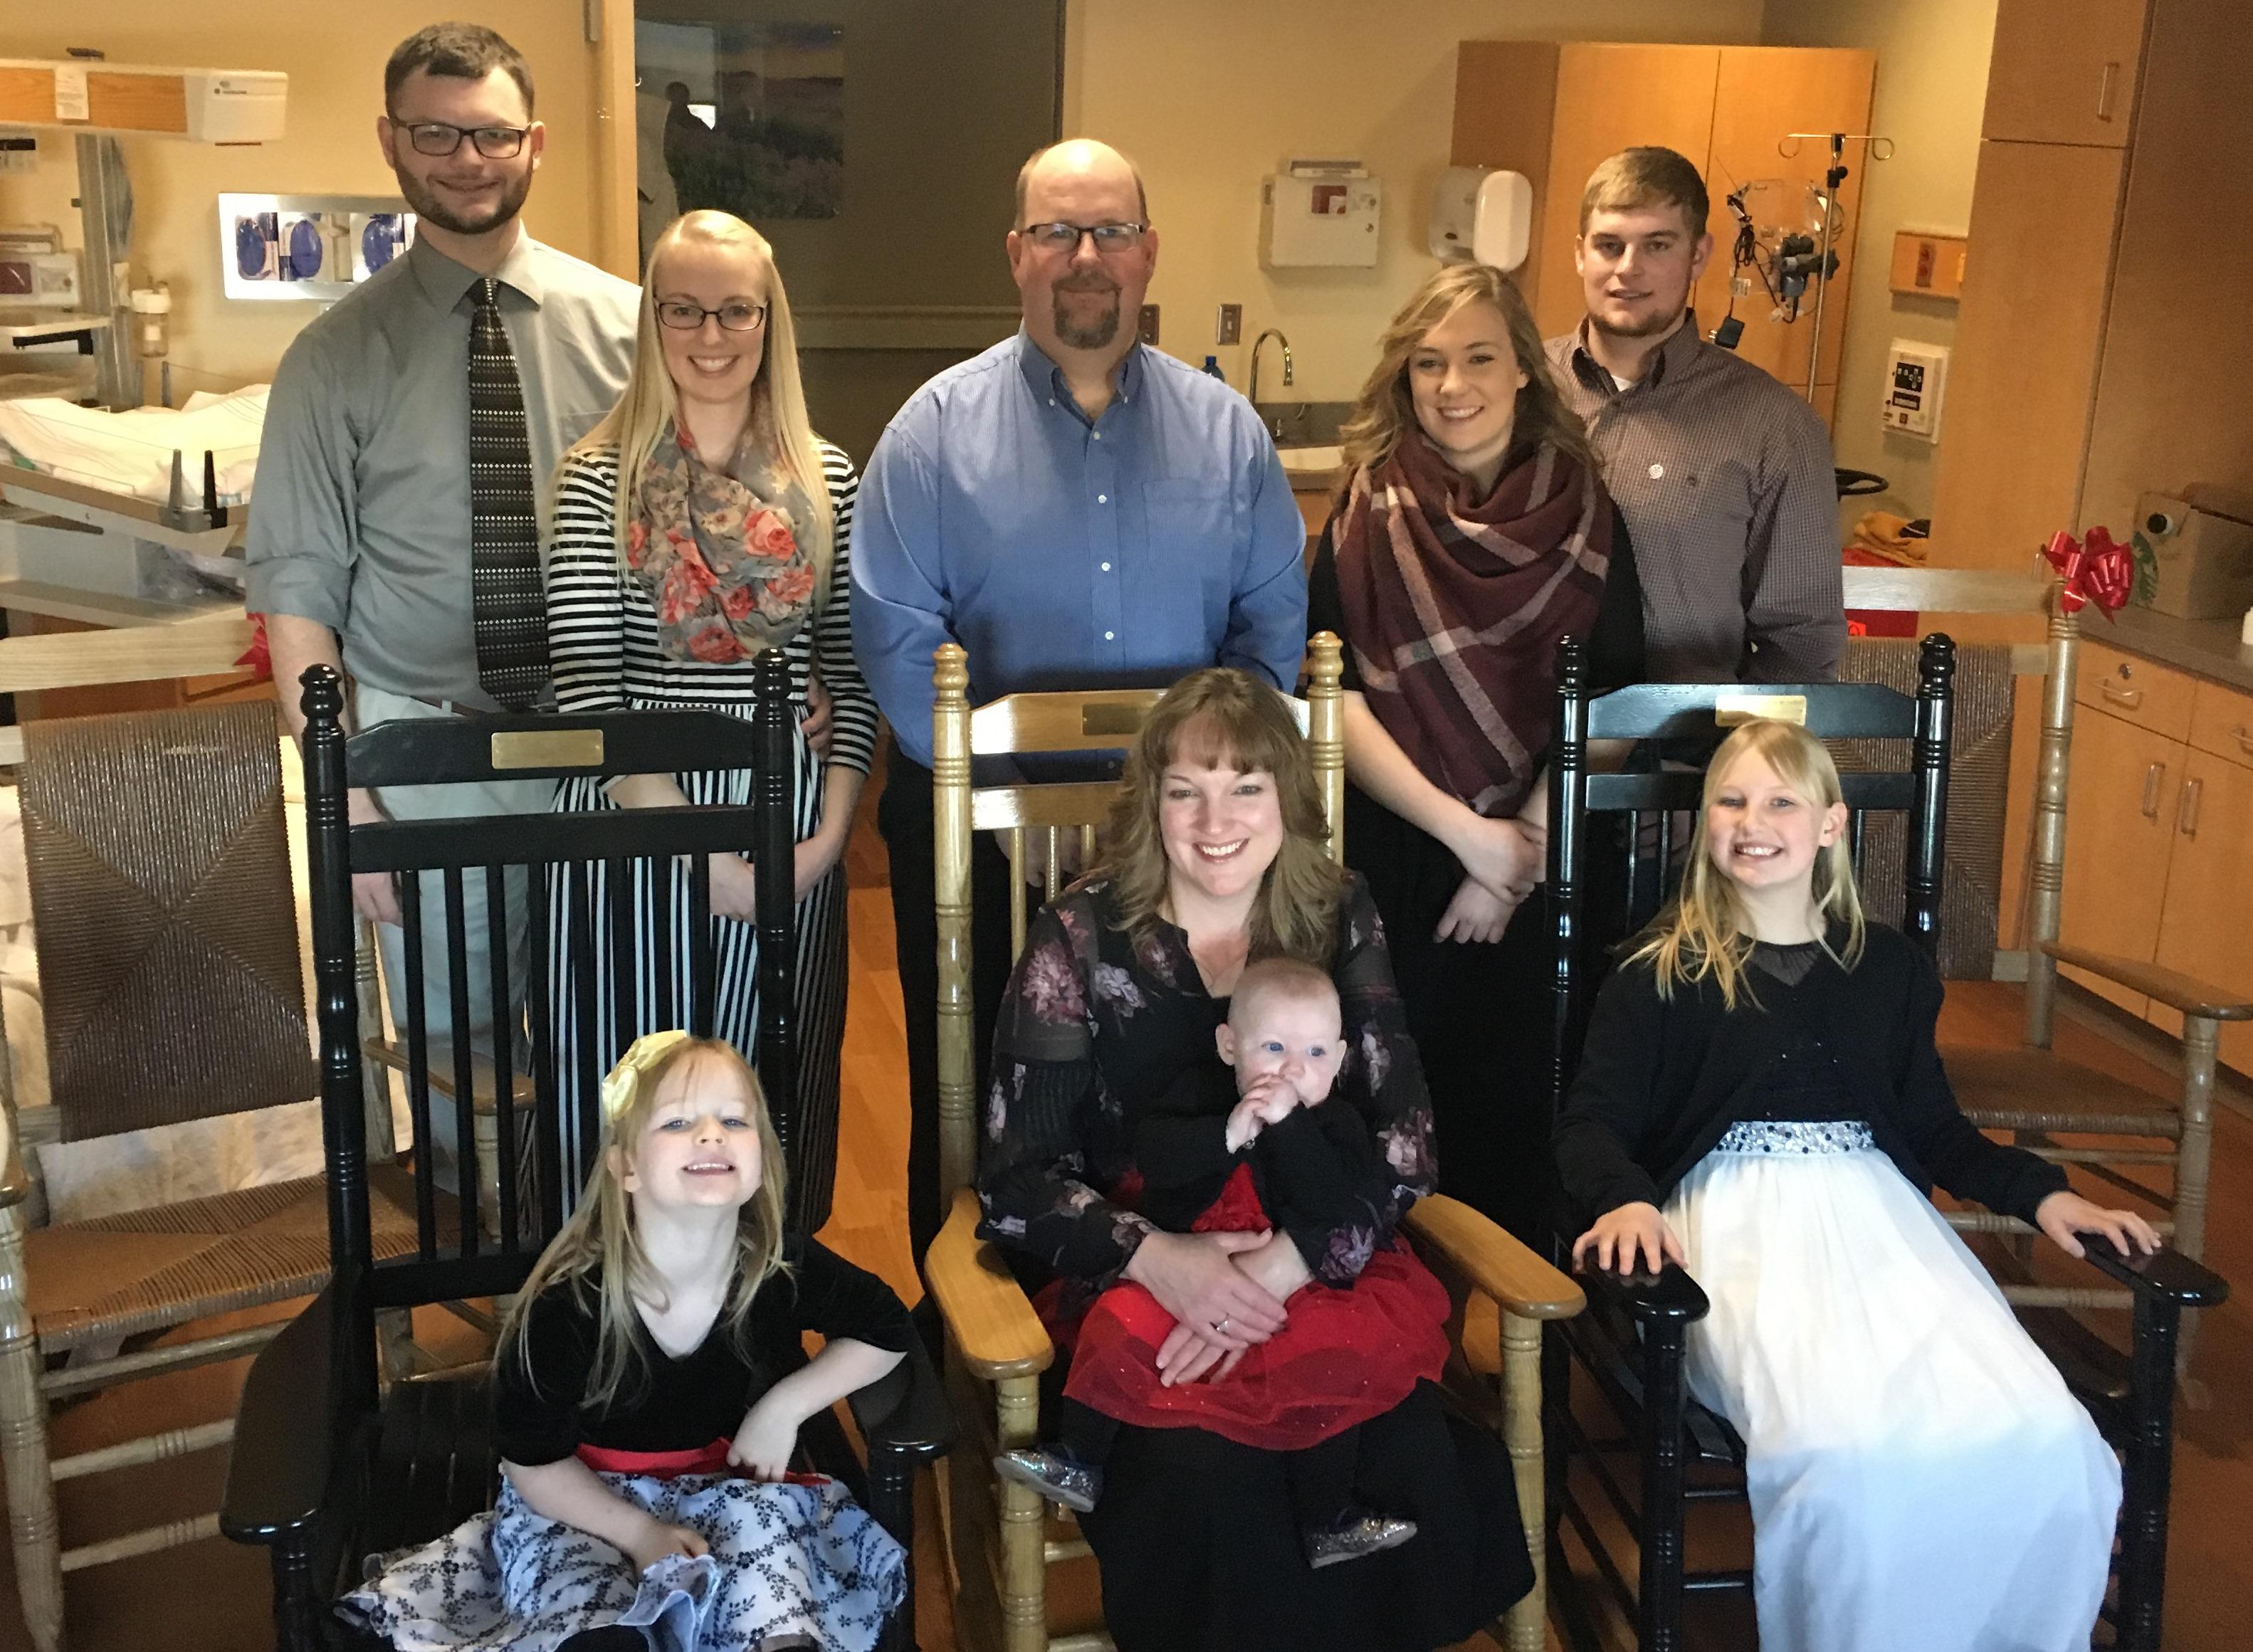 Mom decided to become the center of family photos